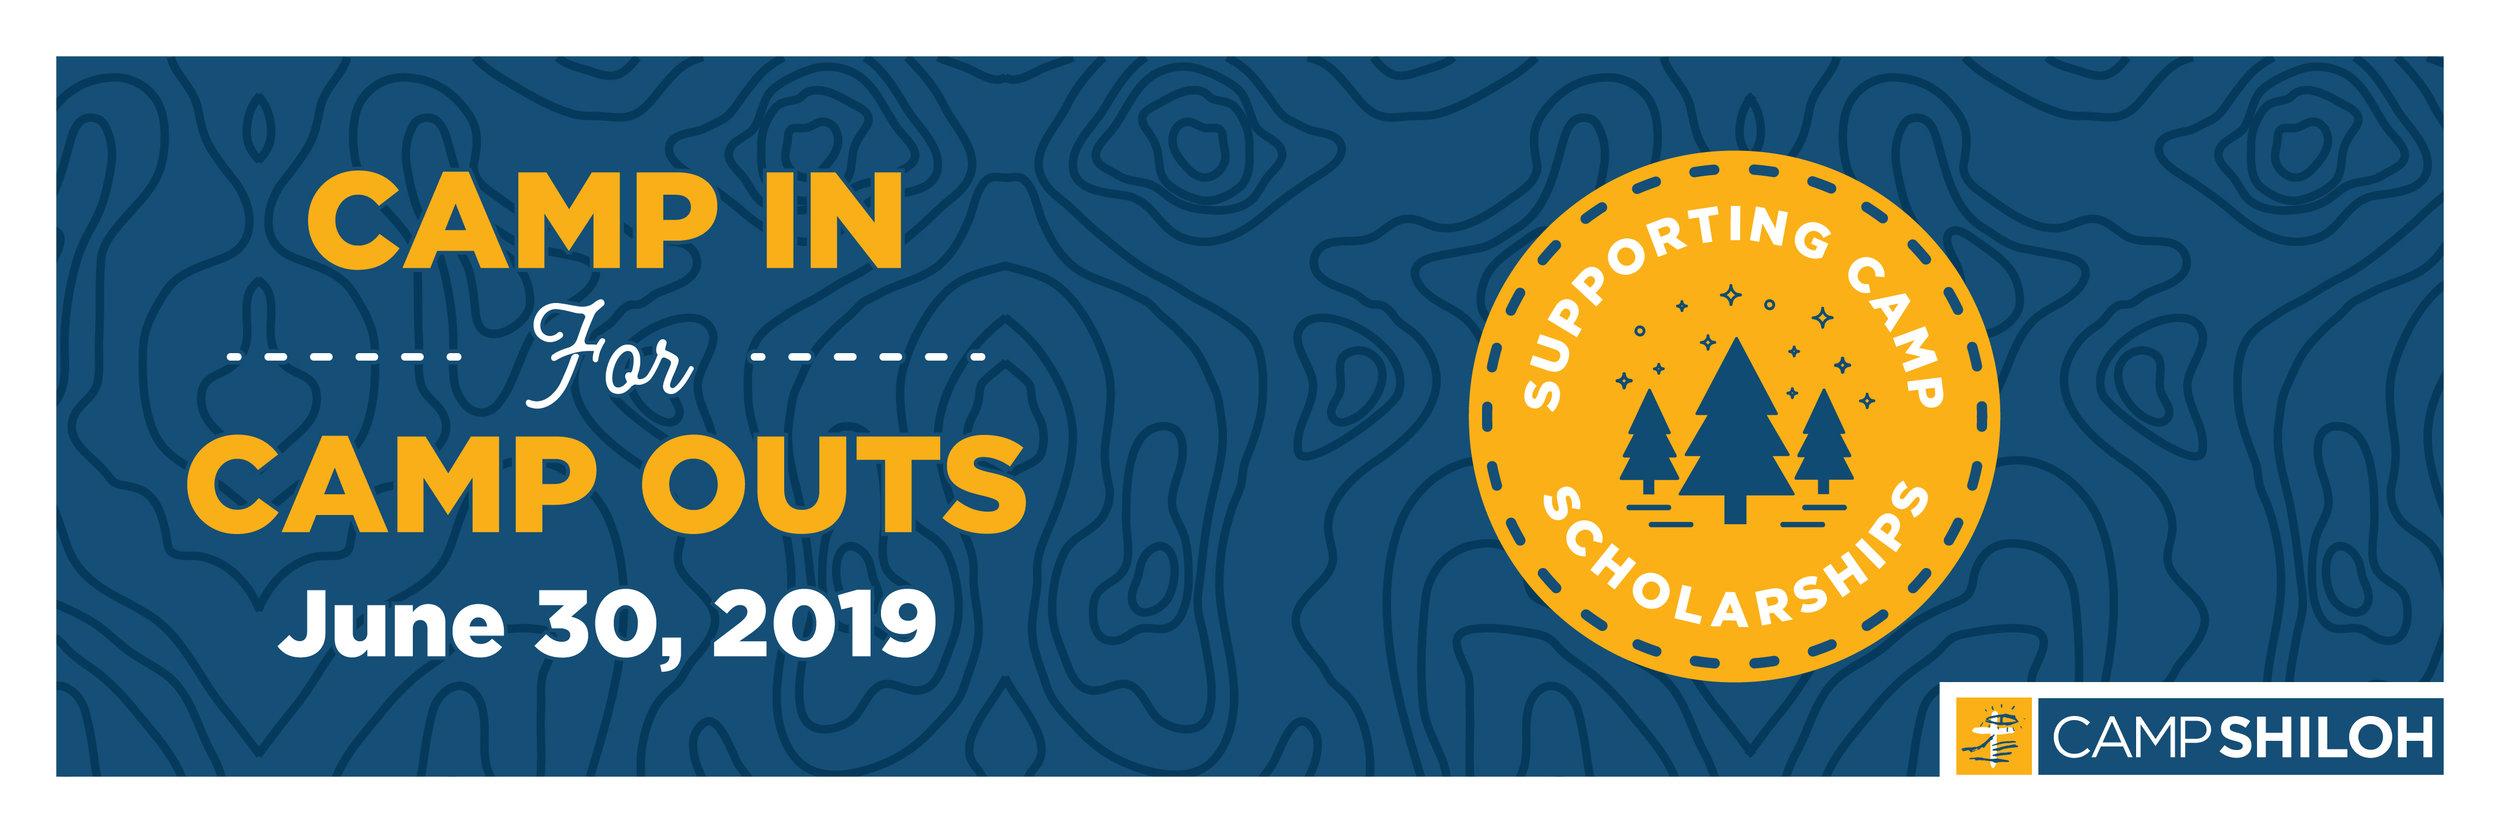 Shiloh 2019 Camp Web Banners-v2_v.jpg